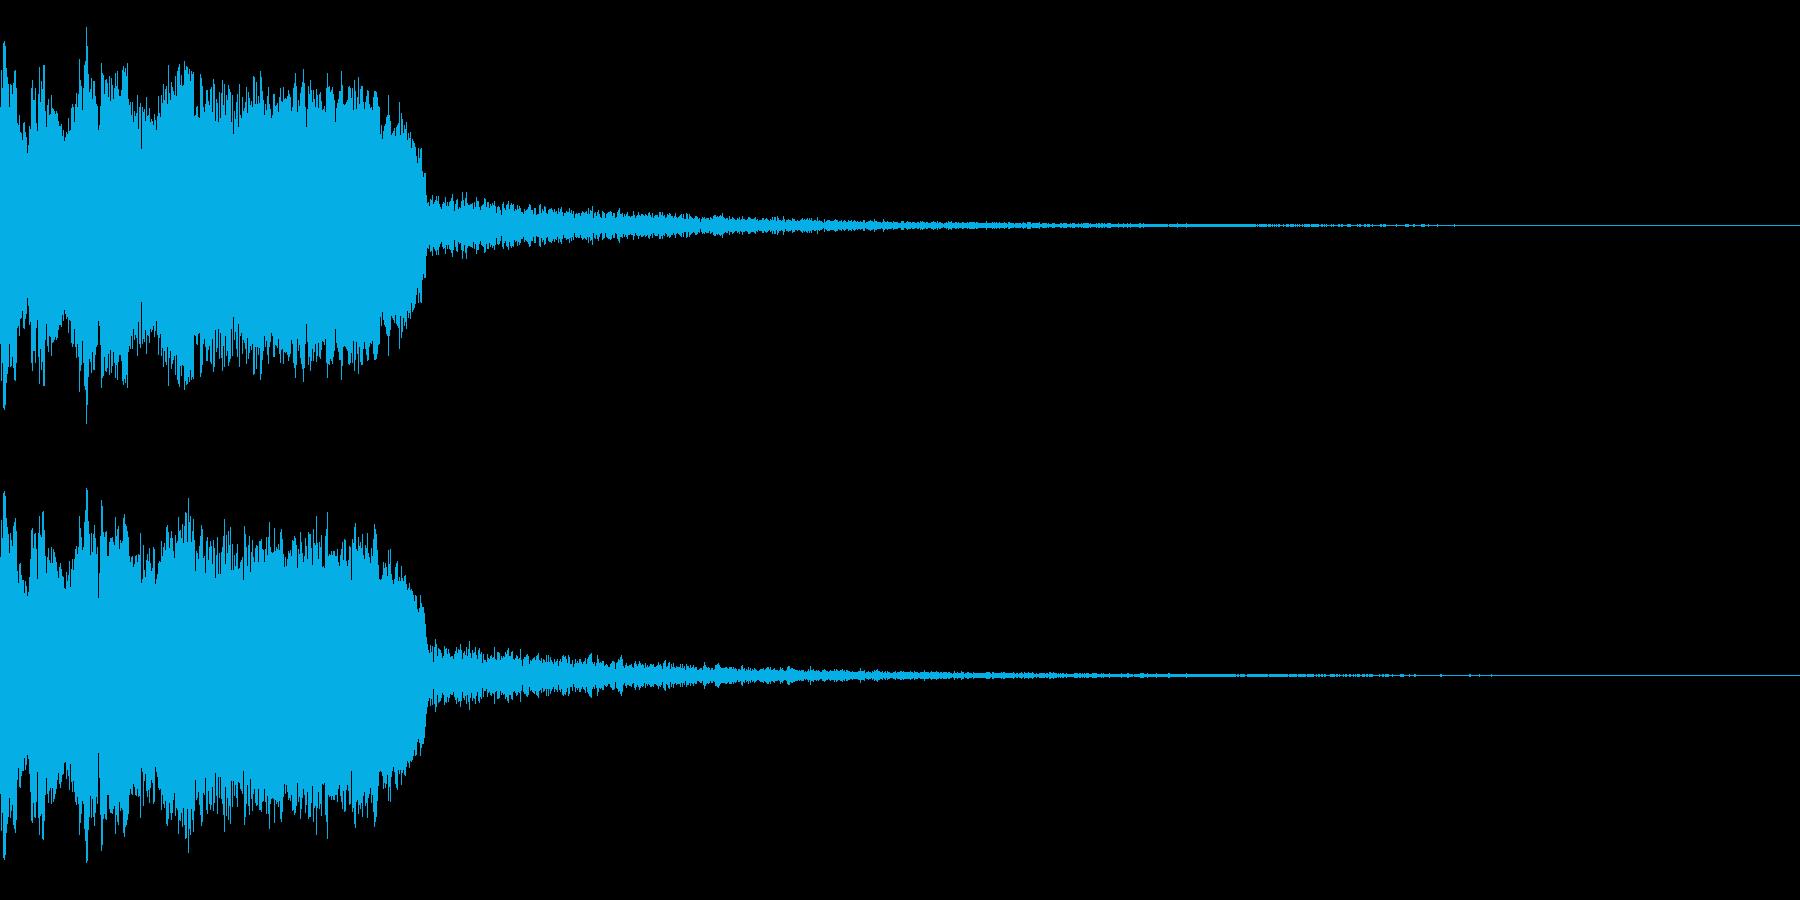 DJFX ヒットチャート発表前SE 9の再生済みの波形